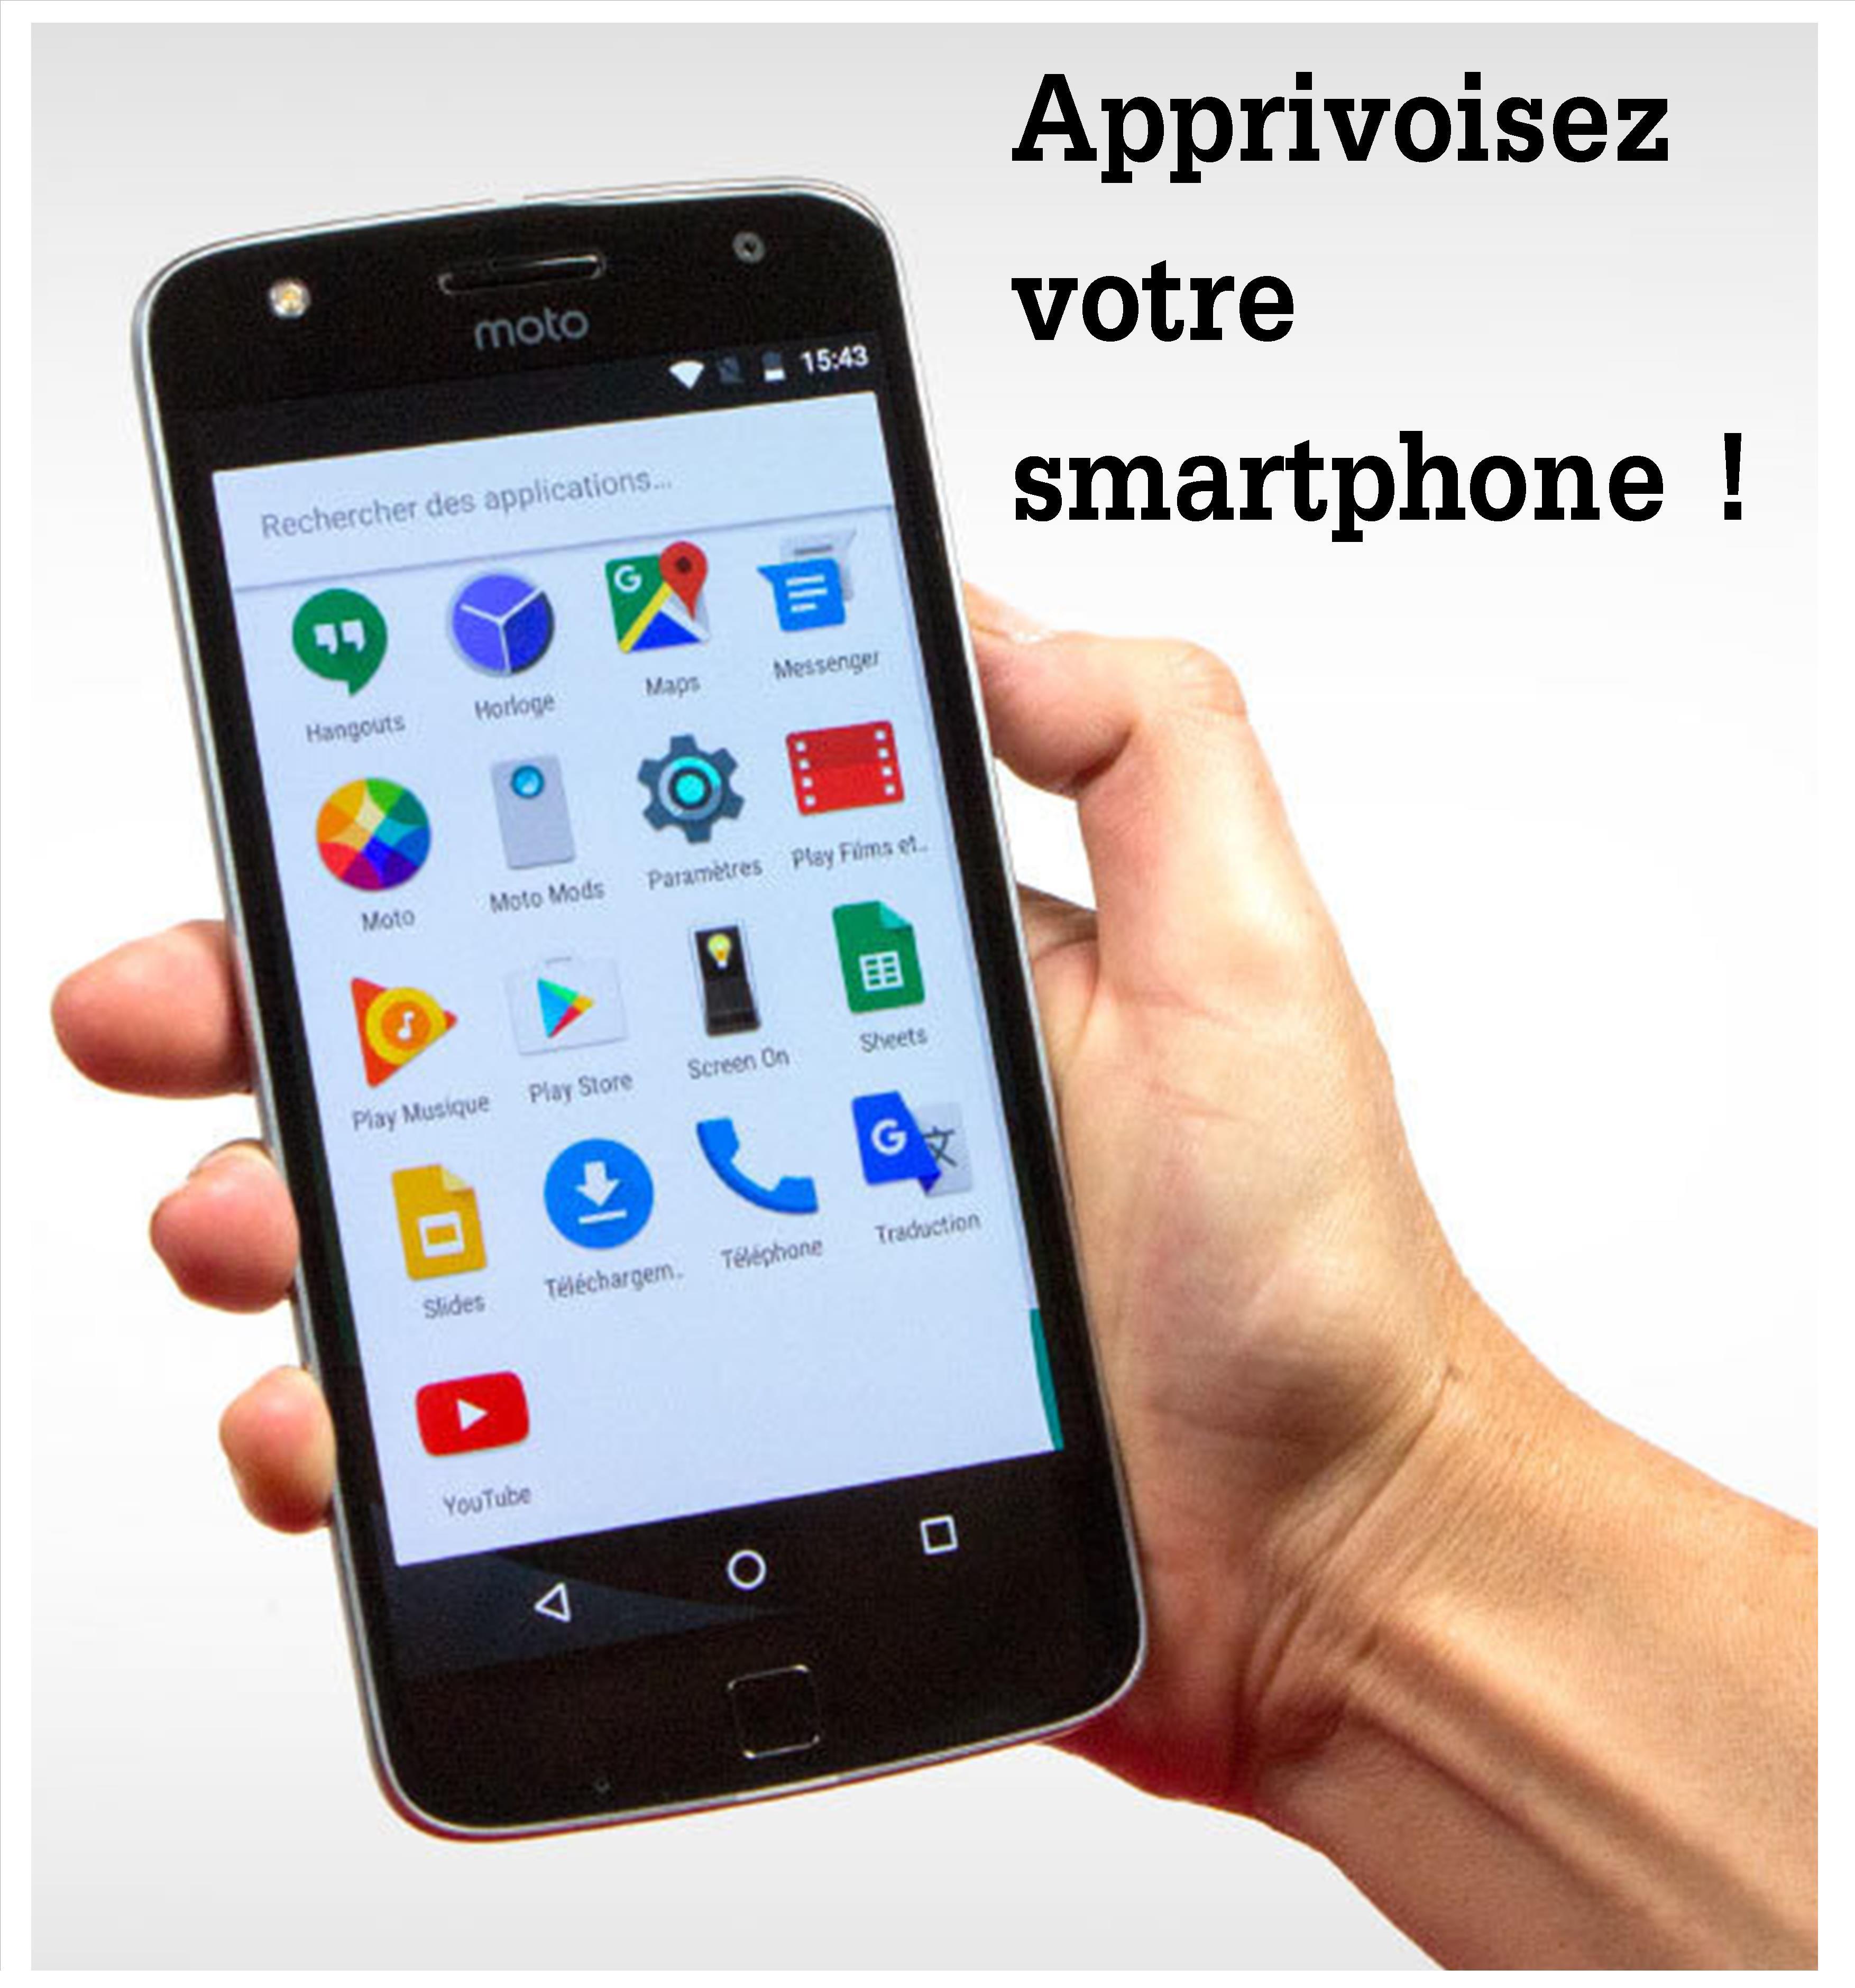 Apprivoisez votre smartphone ! |